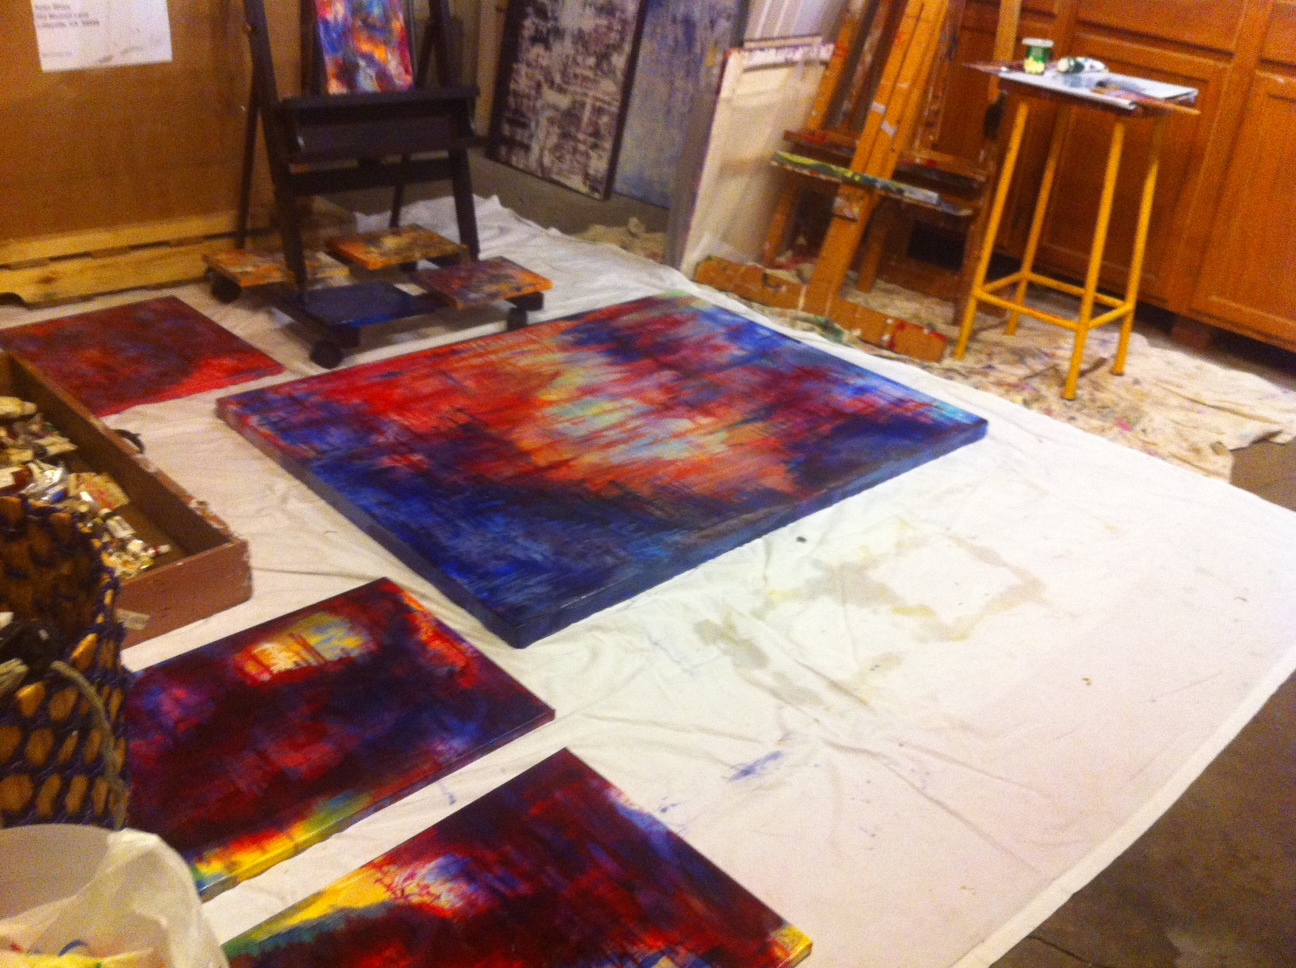 Studio coming together...